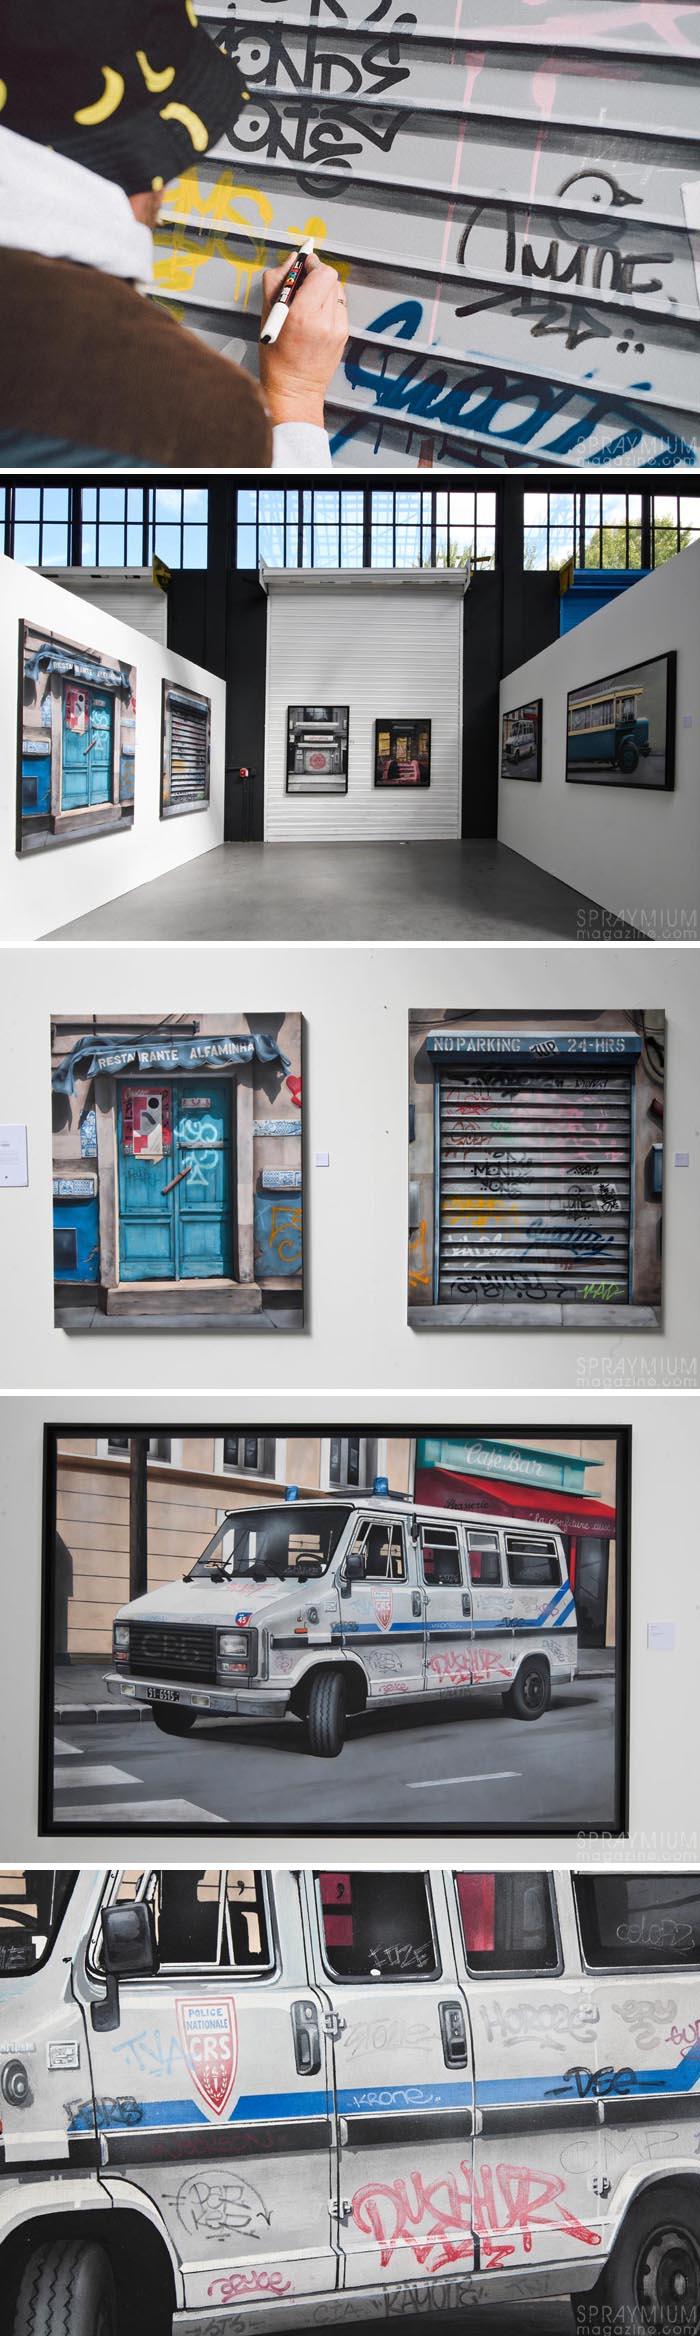 exposition mister freeze toulouse art urbain contemporain graffiti postgraffiti streetart muralism spraymium taroe